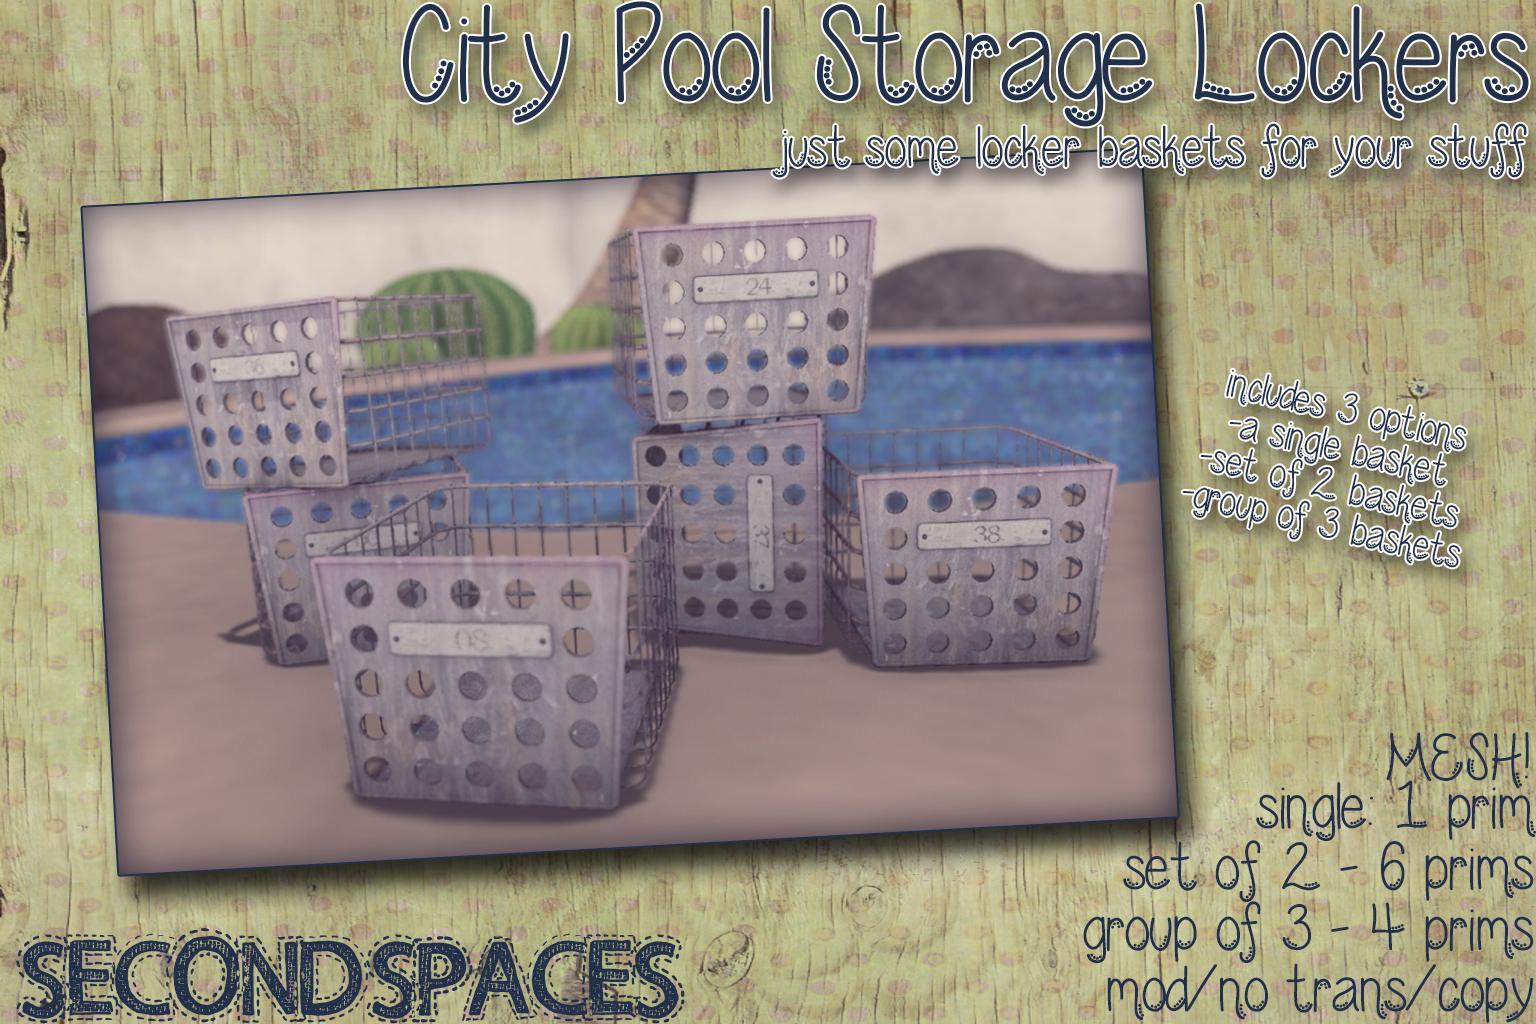 city pool lockers_lockers only_vendor